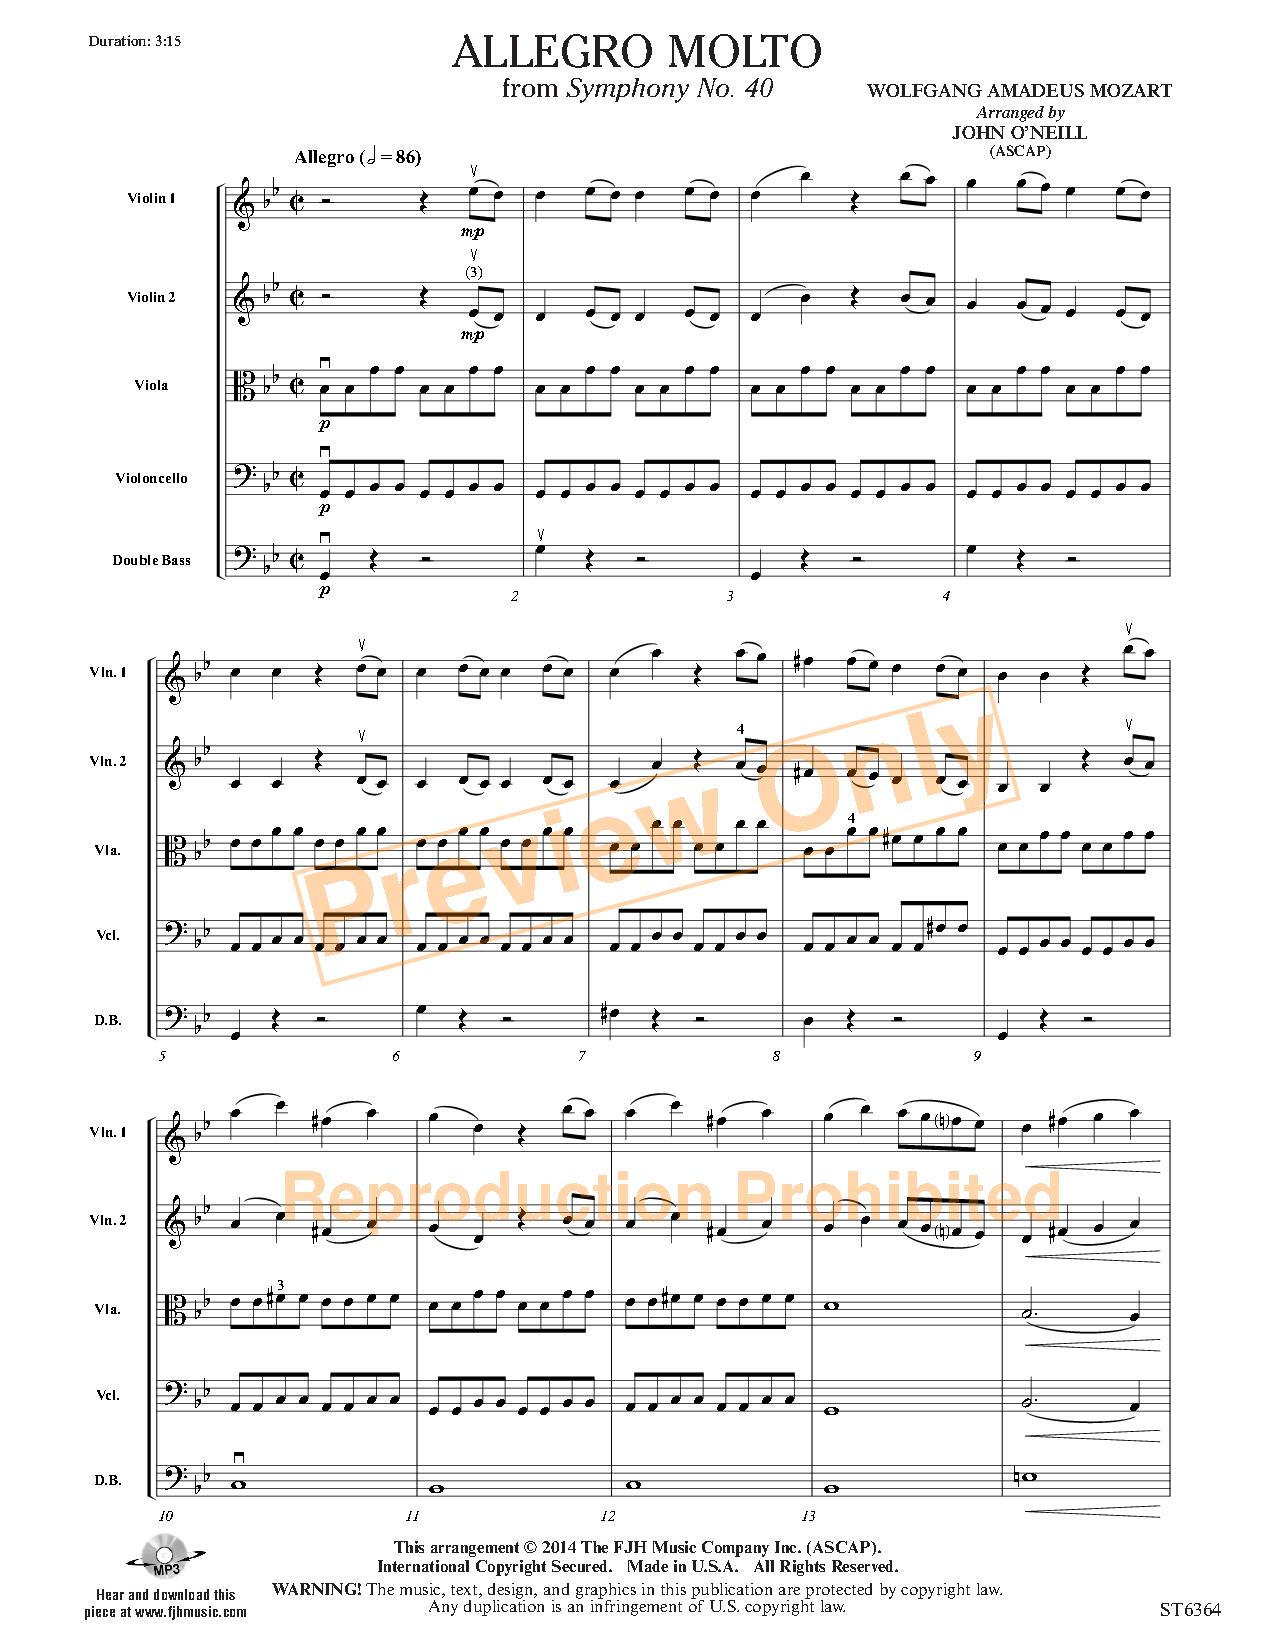 Allegro Molto by W A  Mozart/arr  John O'Neill  J W  Pepper Sheet Music